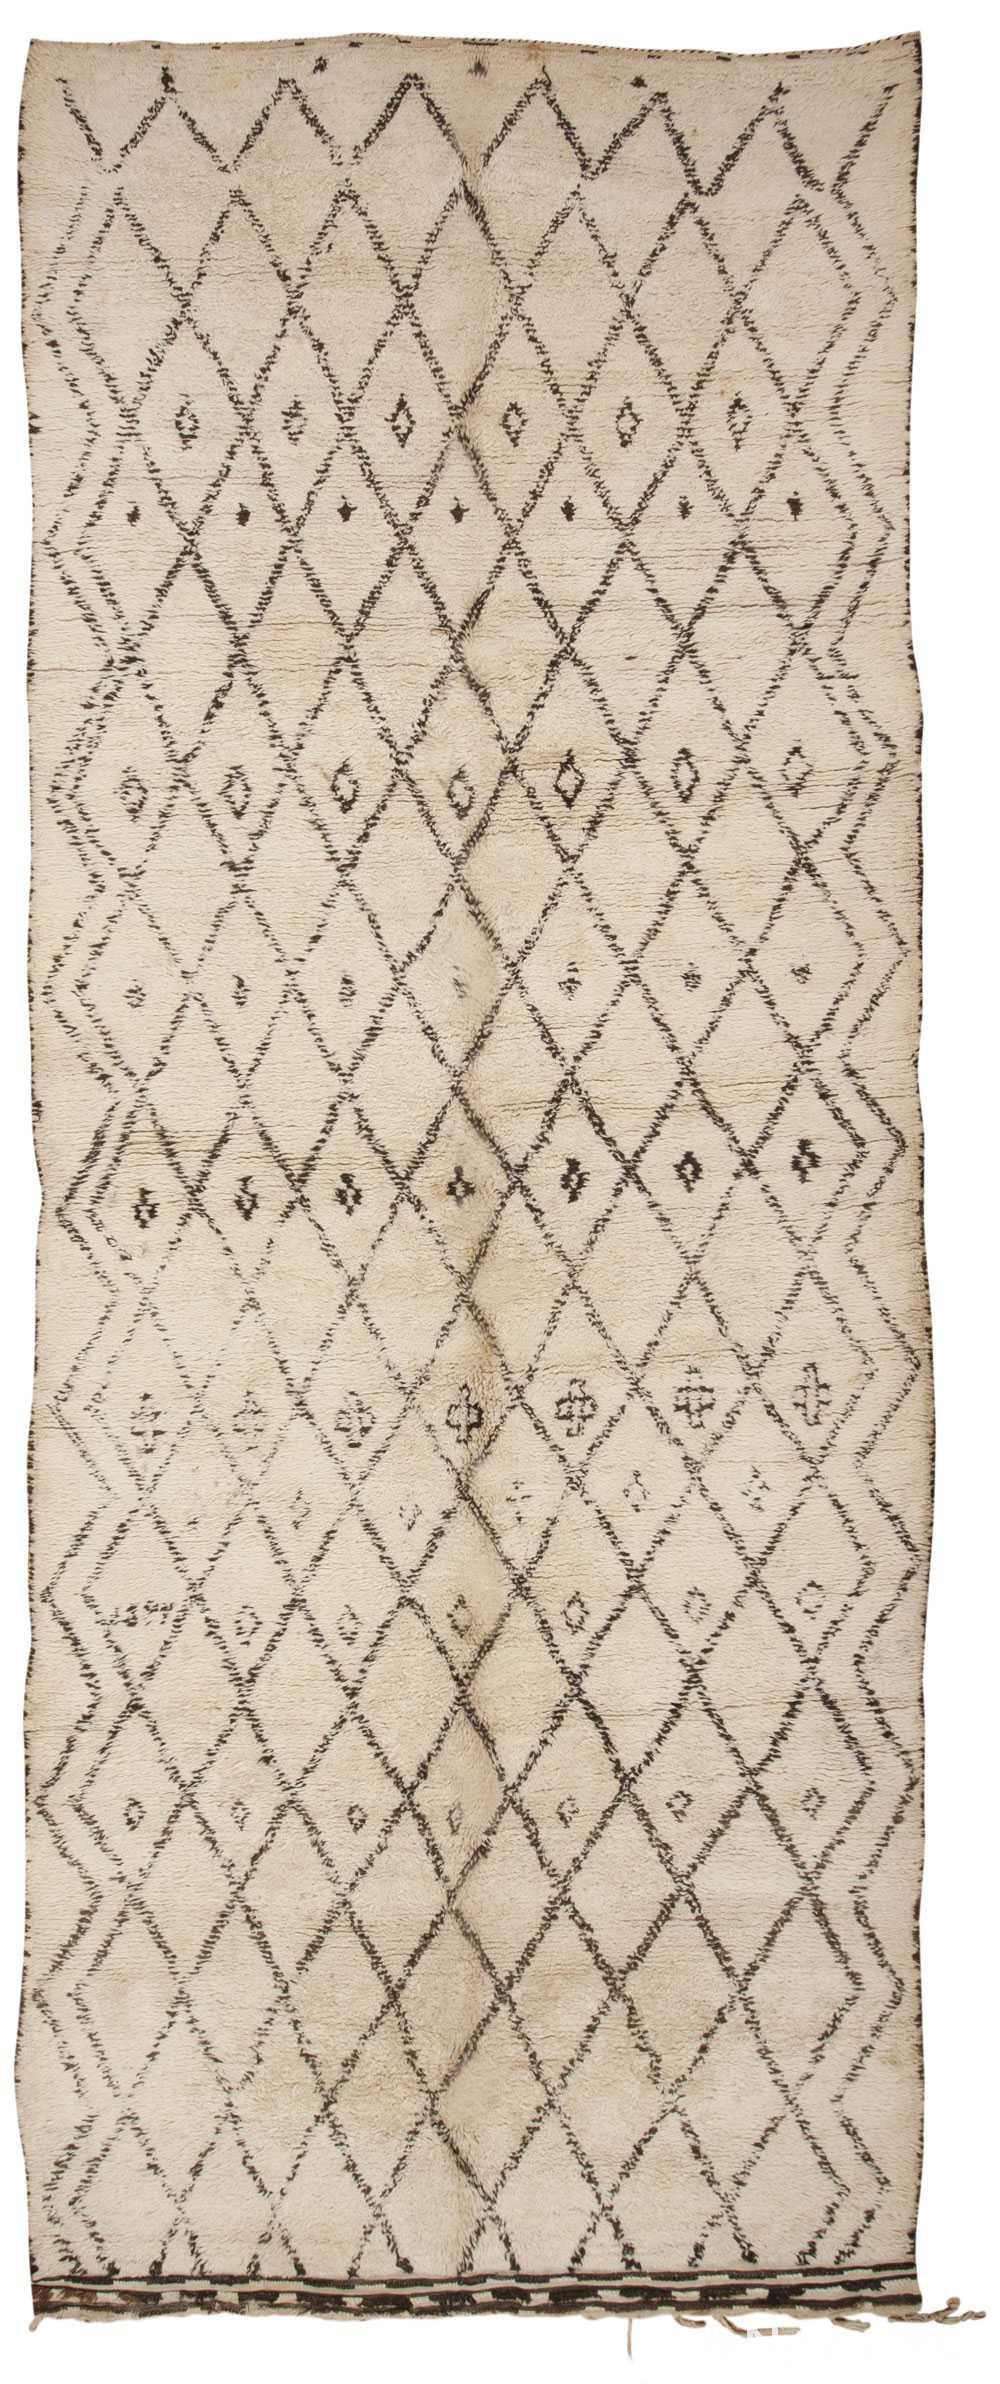 Moroccan Carpet 45326 Detail/Large View